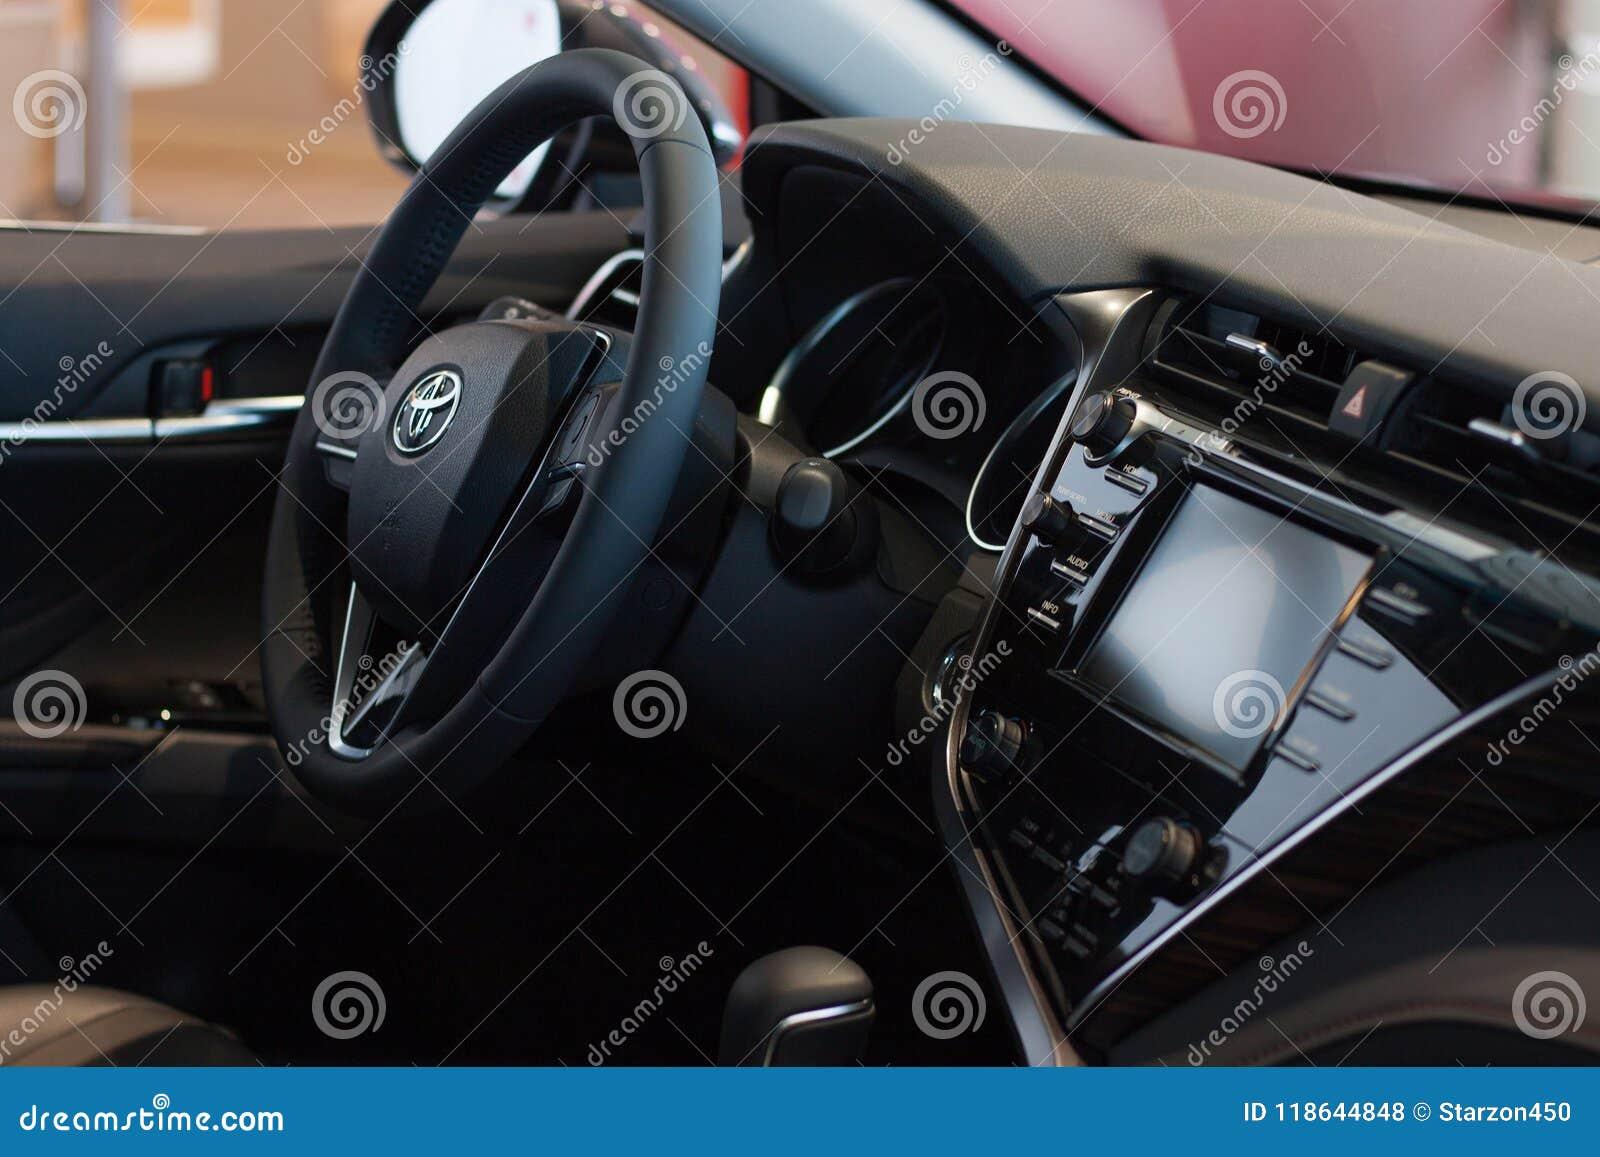 Toyota Camry 2018 Interior >> Russia Izhevsk April 21 2018 Showroom Toyota Interior